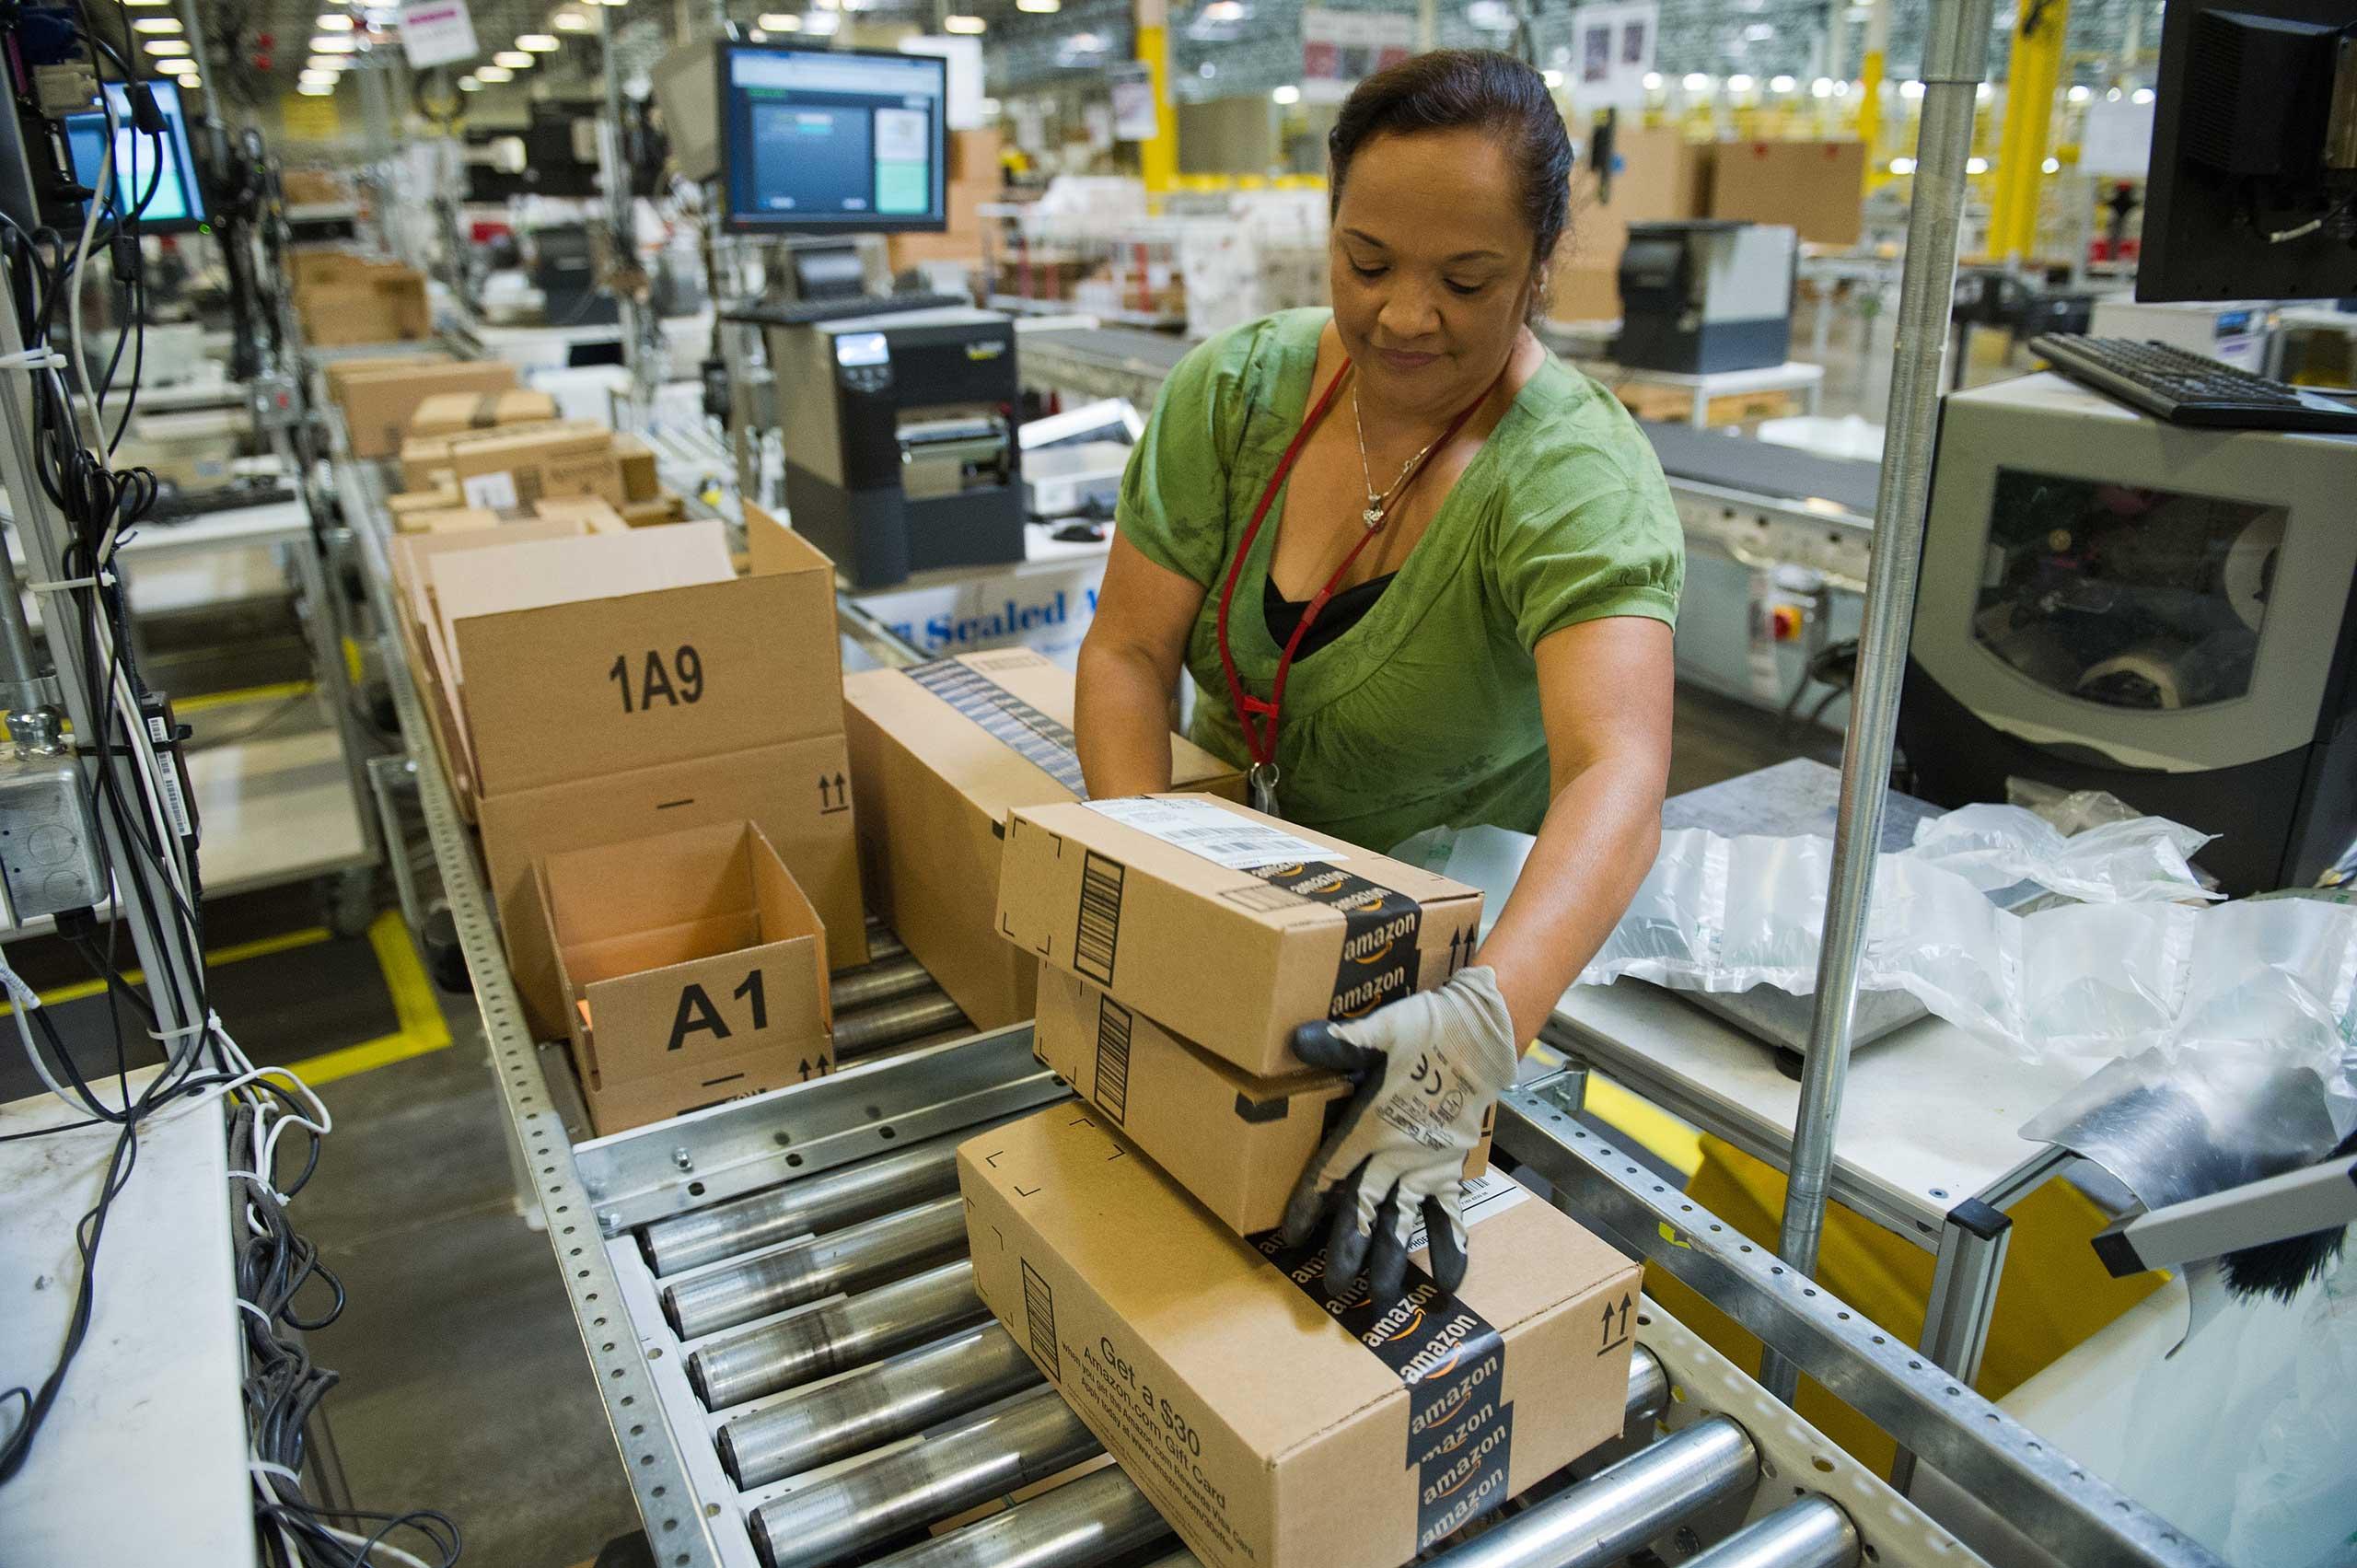 Lavoro-Subito-Amazon-Assume